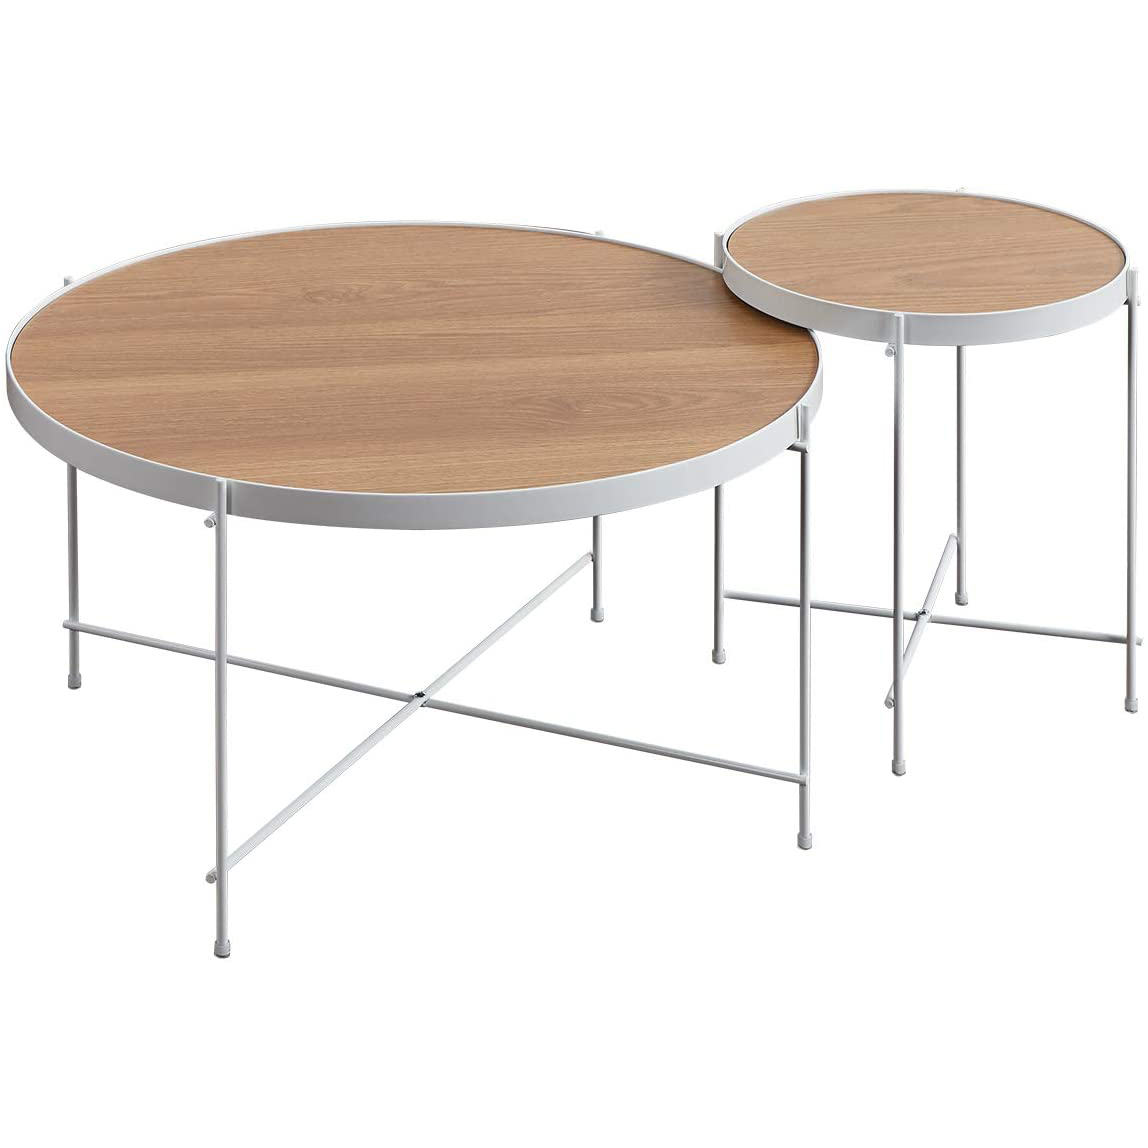 Sekey Home Round Coffee Table Light Black Oak Top Durable Metal White Frame Walmart Com Walmart Com [ 1148 x 1148 Pixel ]